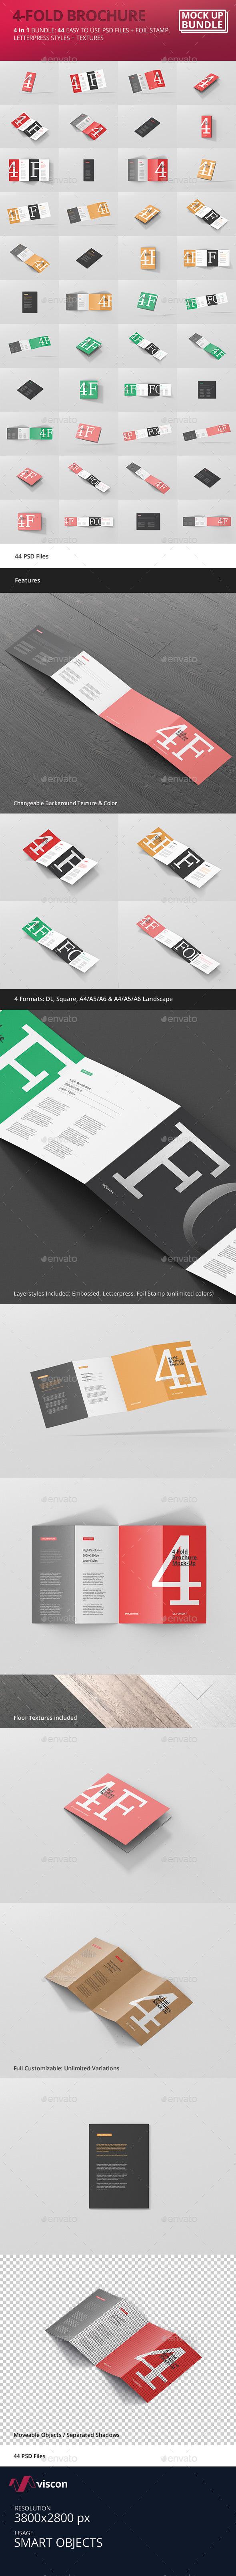 GraphicRiver 4-Fold Brochure Mockup Bundle 20411533